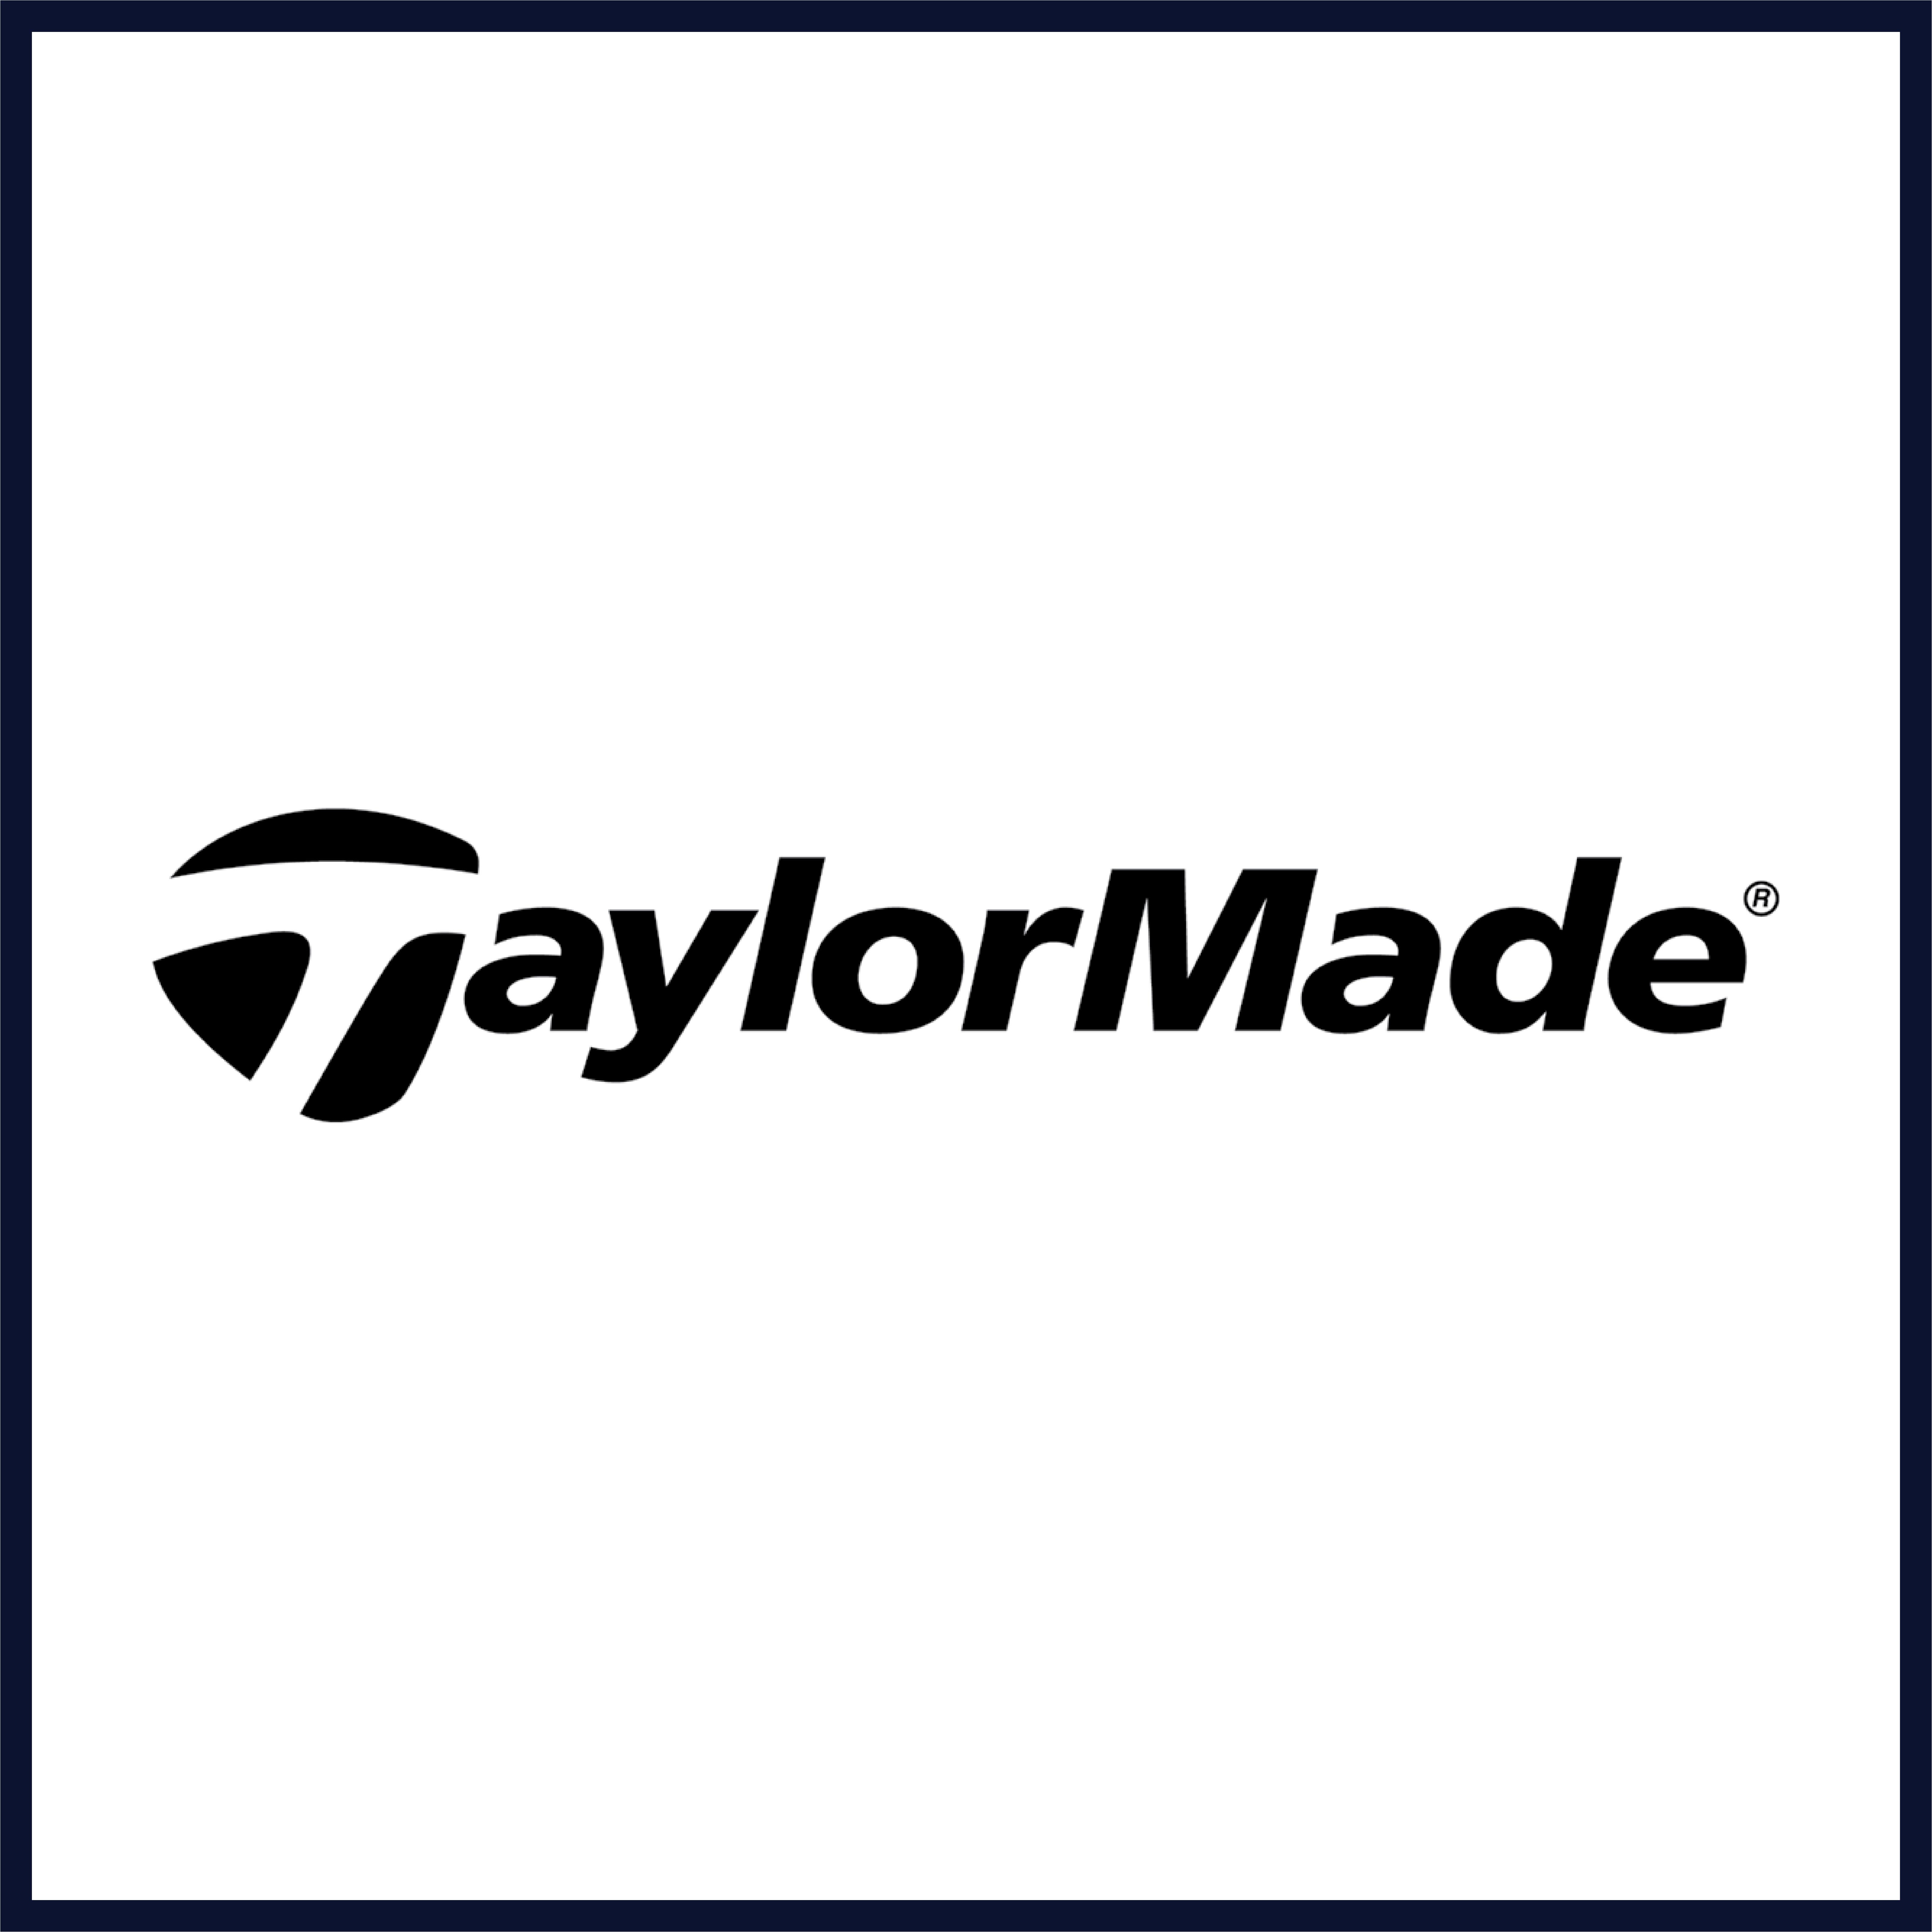 taylor made logo